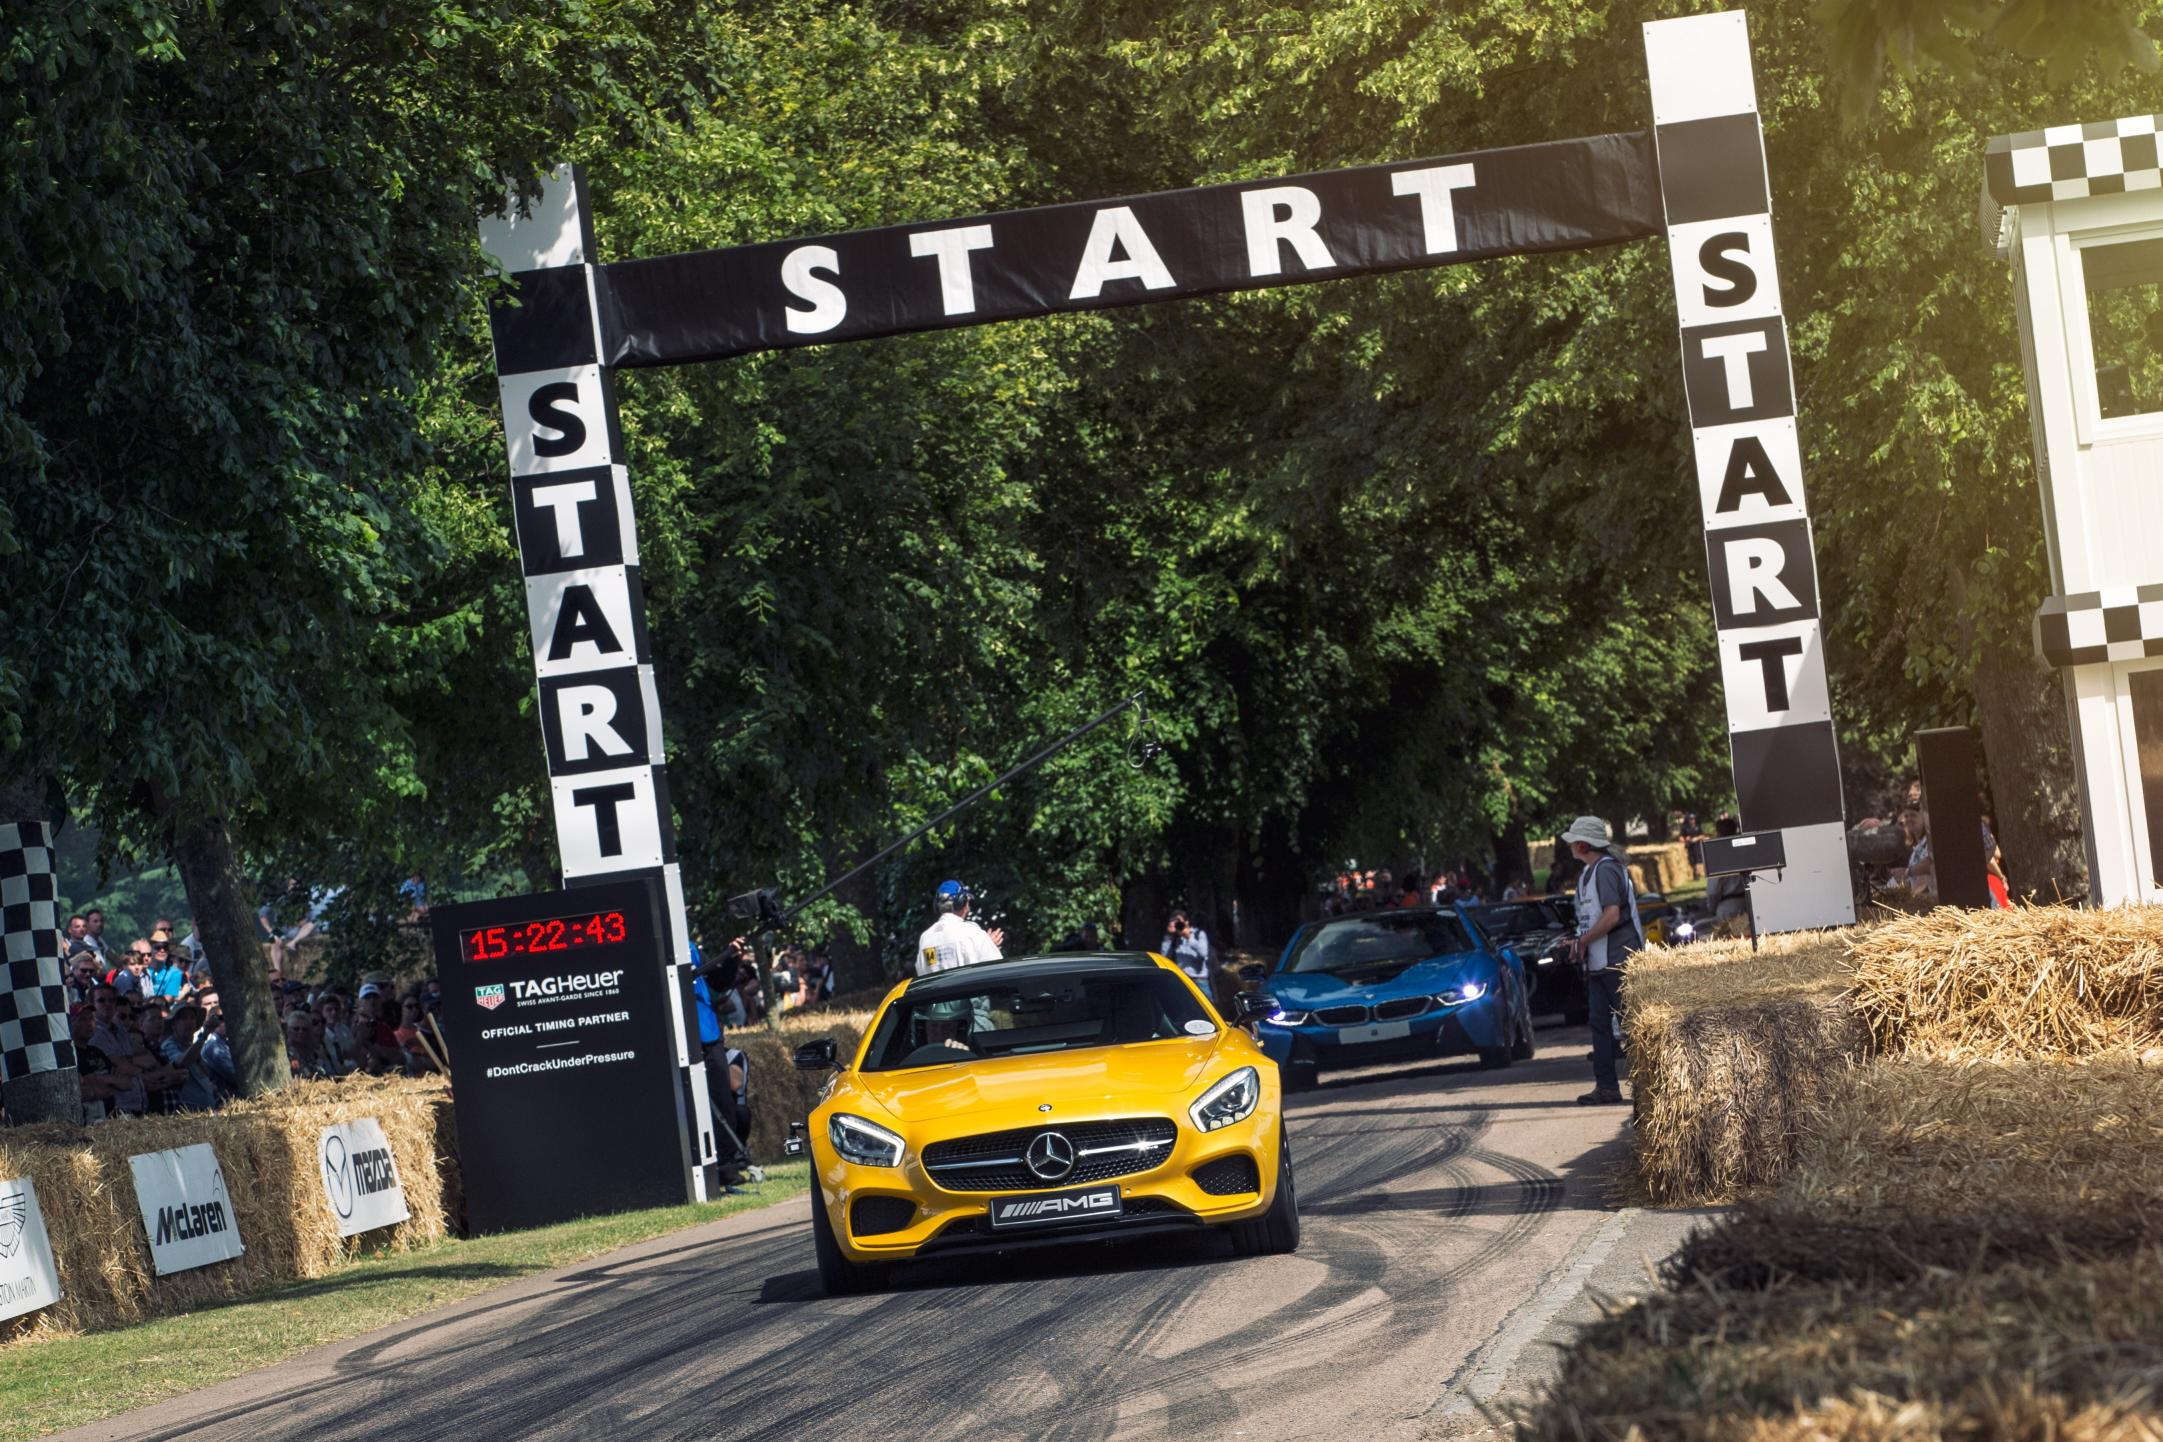 Goodwood Mercedes AMG GT